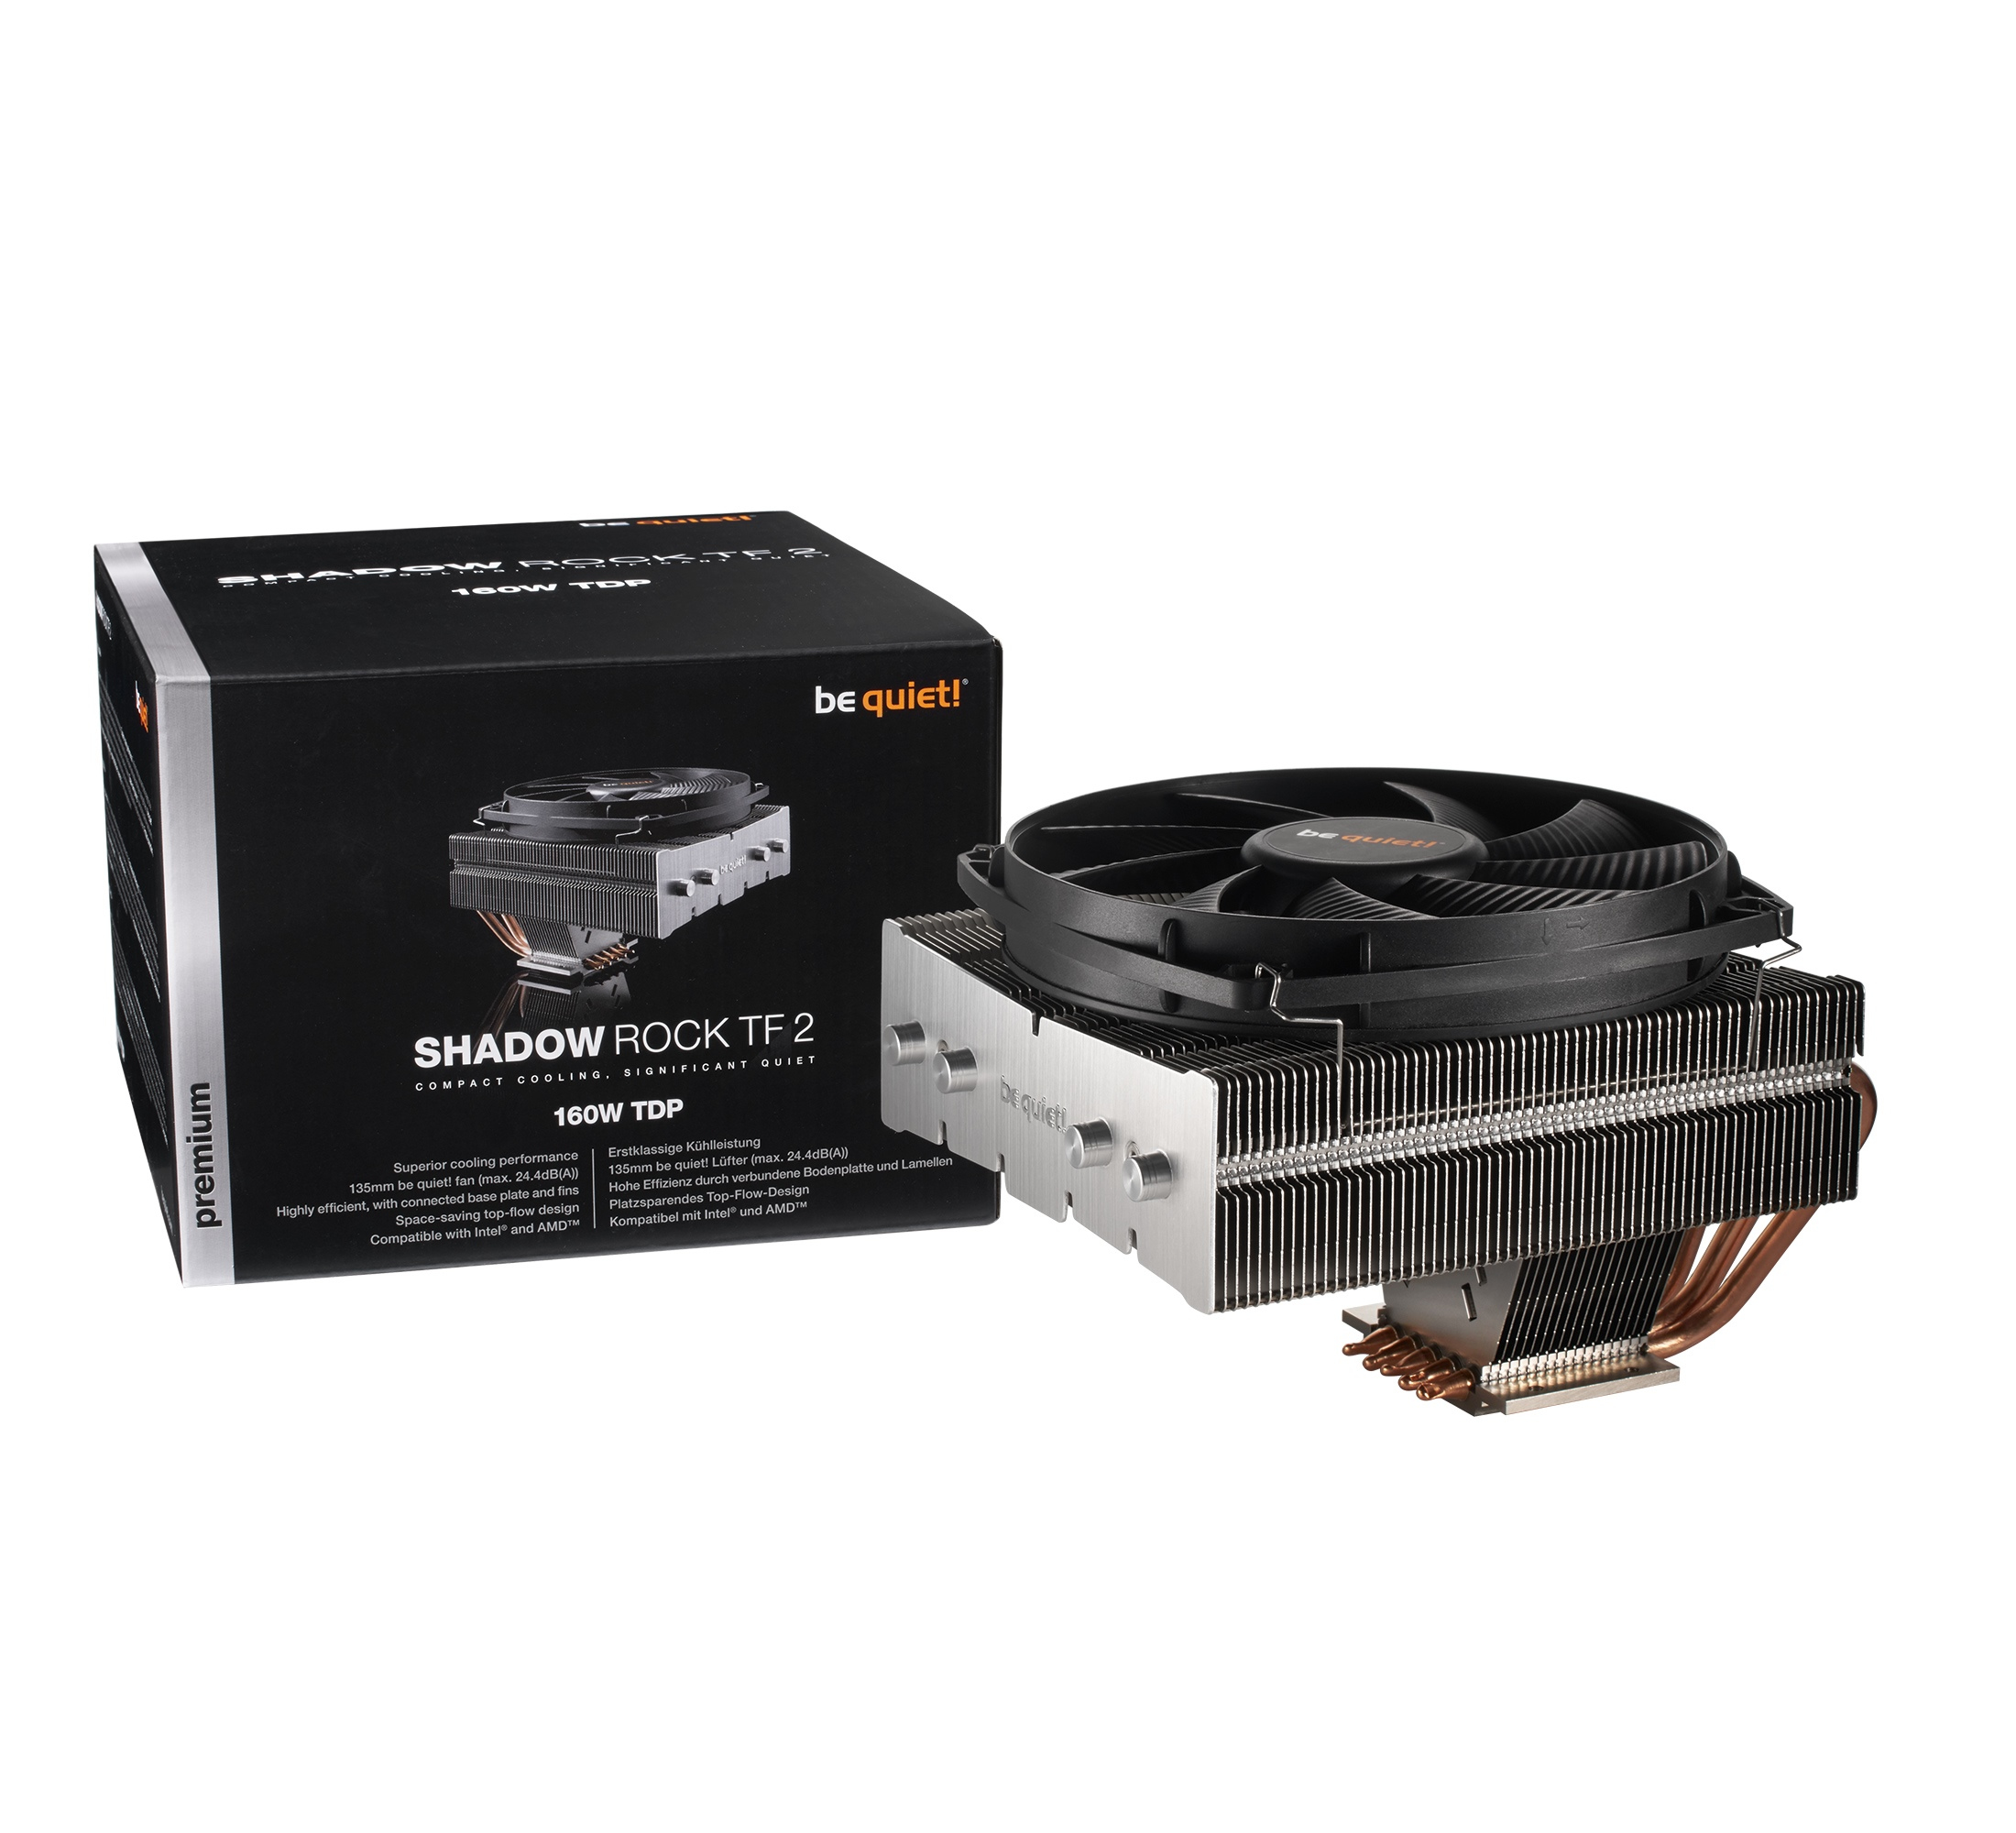 be quiet! Shadow Rock TF 2, Top Down design, 160W TDP, 135mm fan, Intel 775, 115X, 1366, 2011, 2066 AMD AM2, AM3, FM1, FM2